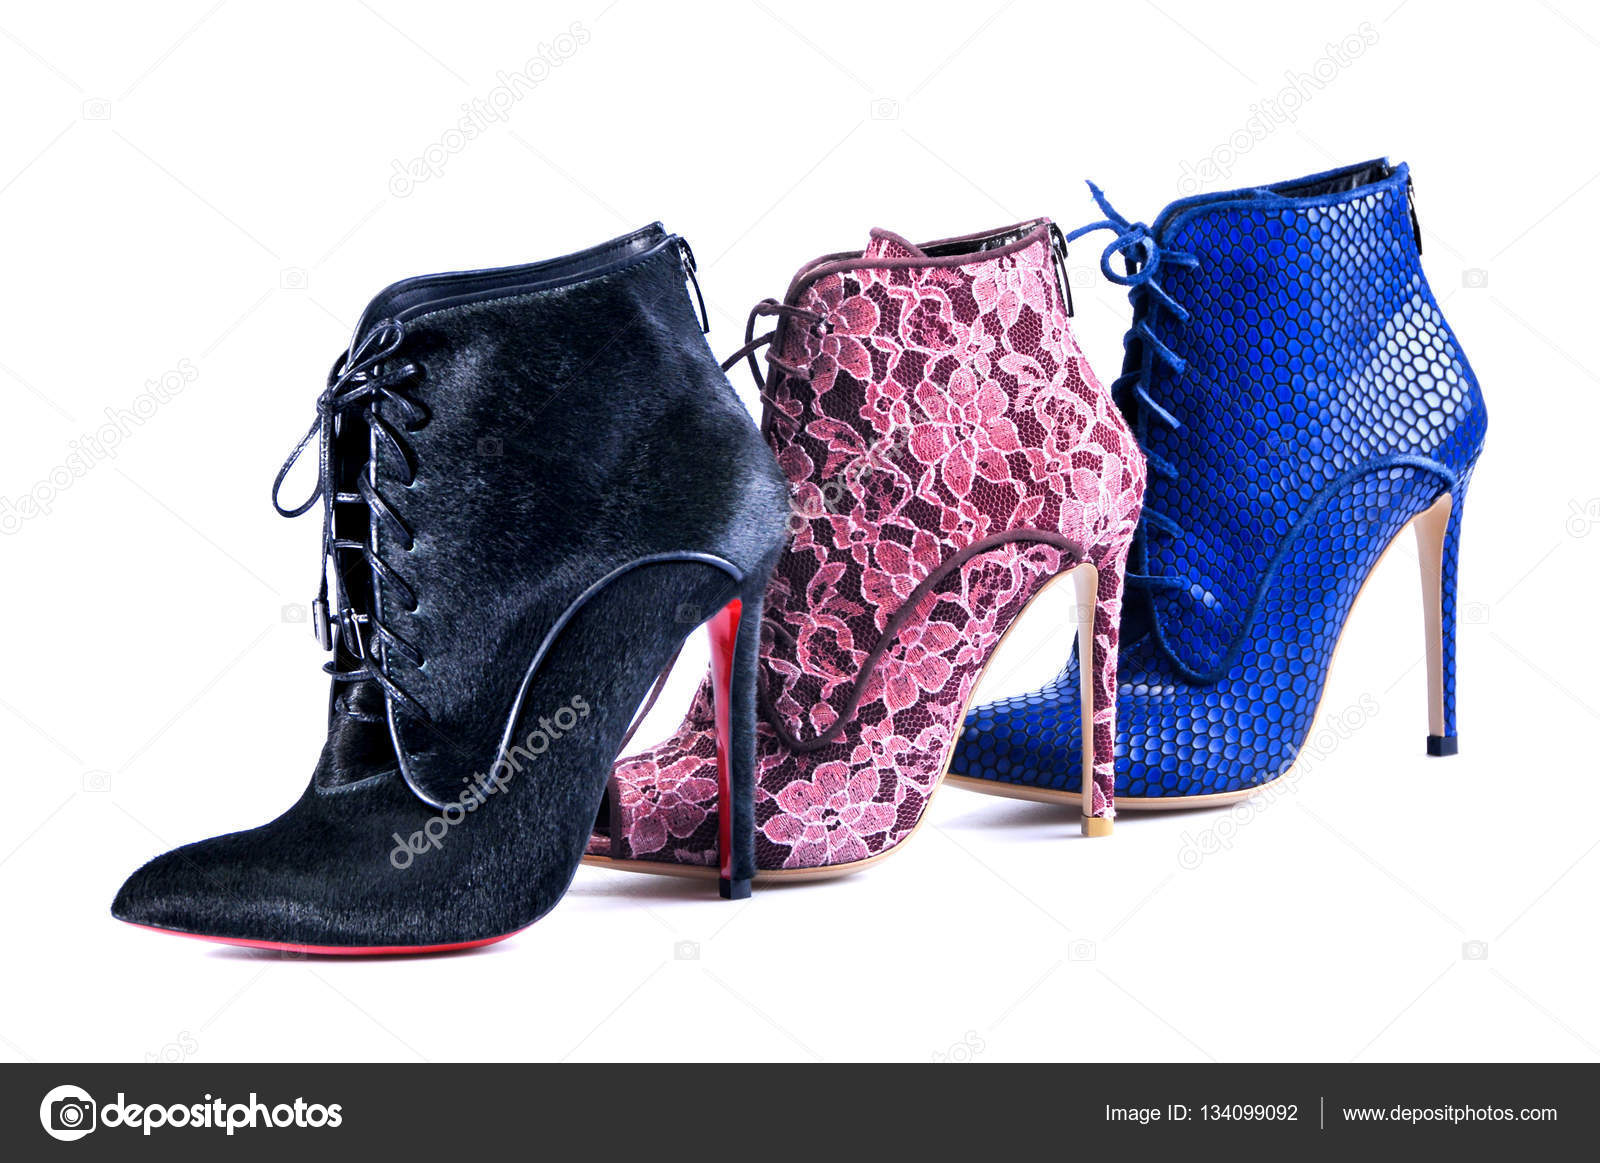 13c8671699 Σέξι Γυναικεία παπούτσια σε λευκό φόντο. Φωτεινό δαντέλα μπλε ...